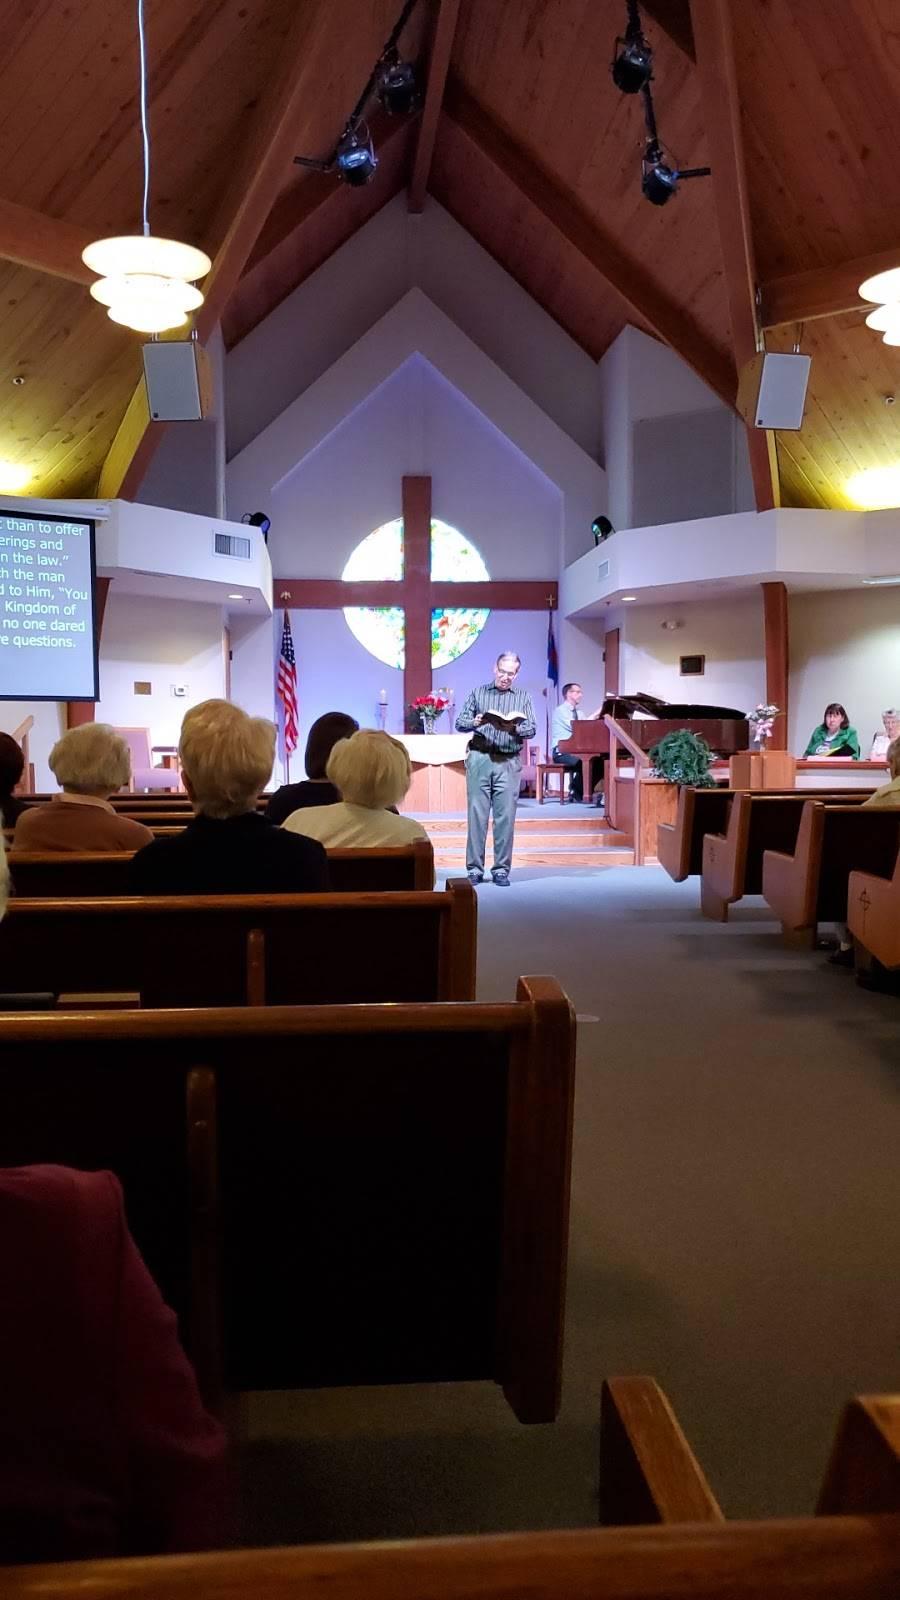 Celtic Cross Church - church  | Photo 5 of 5 | Address: 5839 Dewey Dr, Citrus Heights, CA 95621, USA | Phone: (916) 967-1414